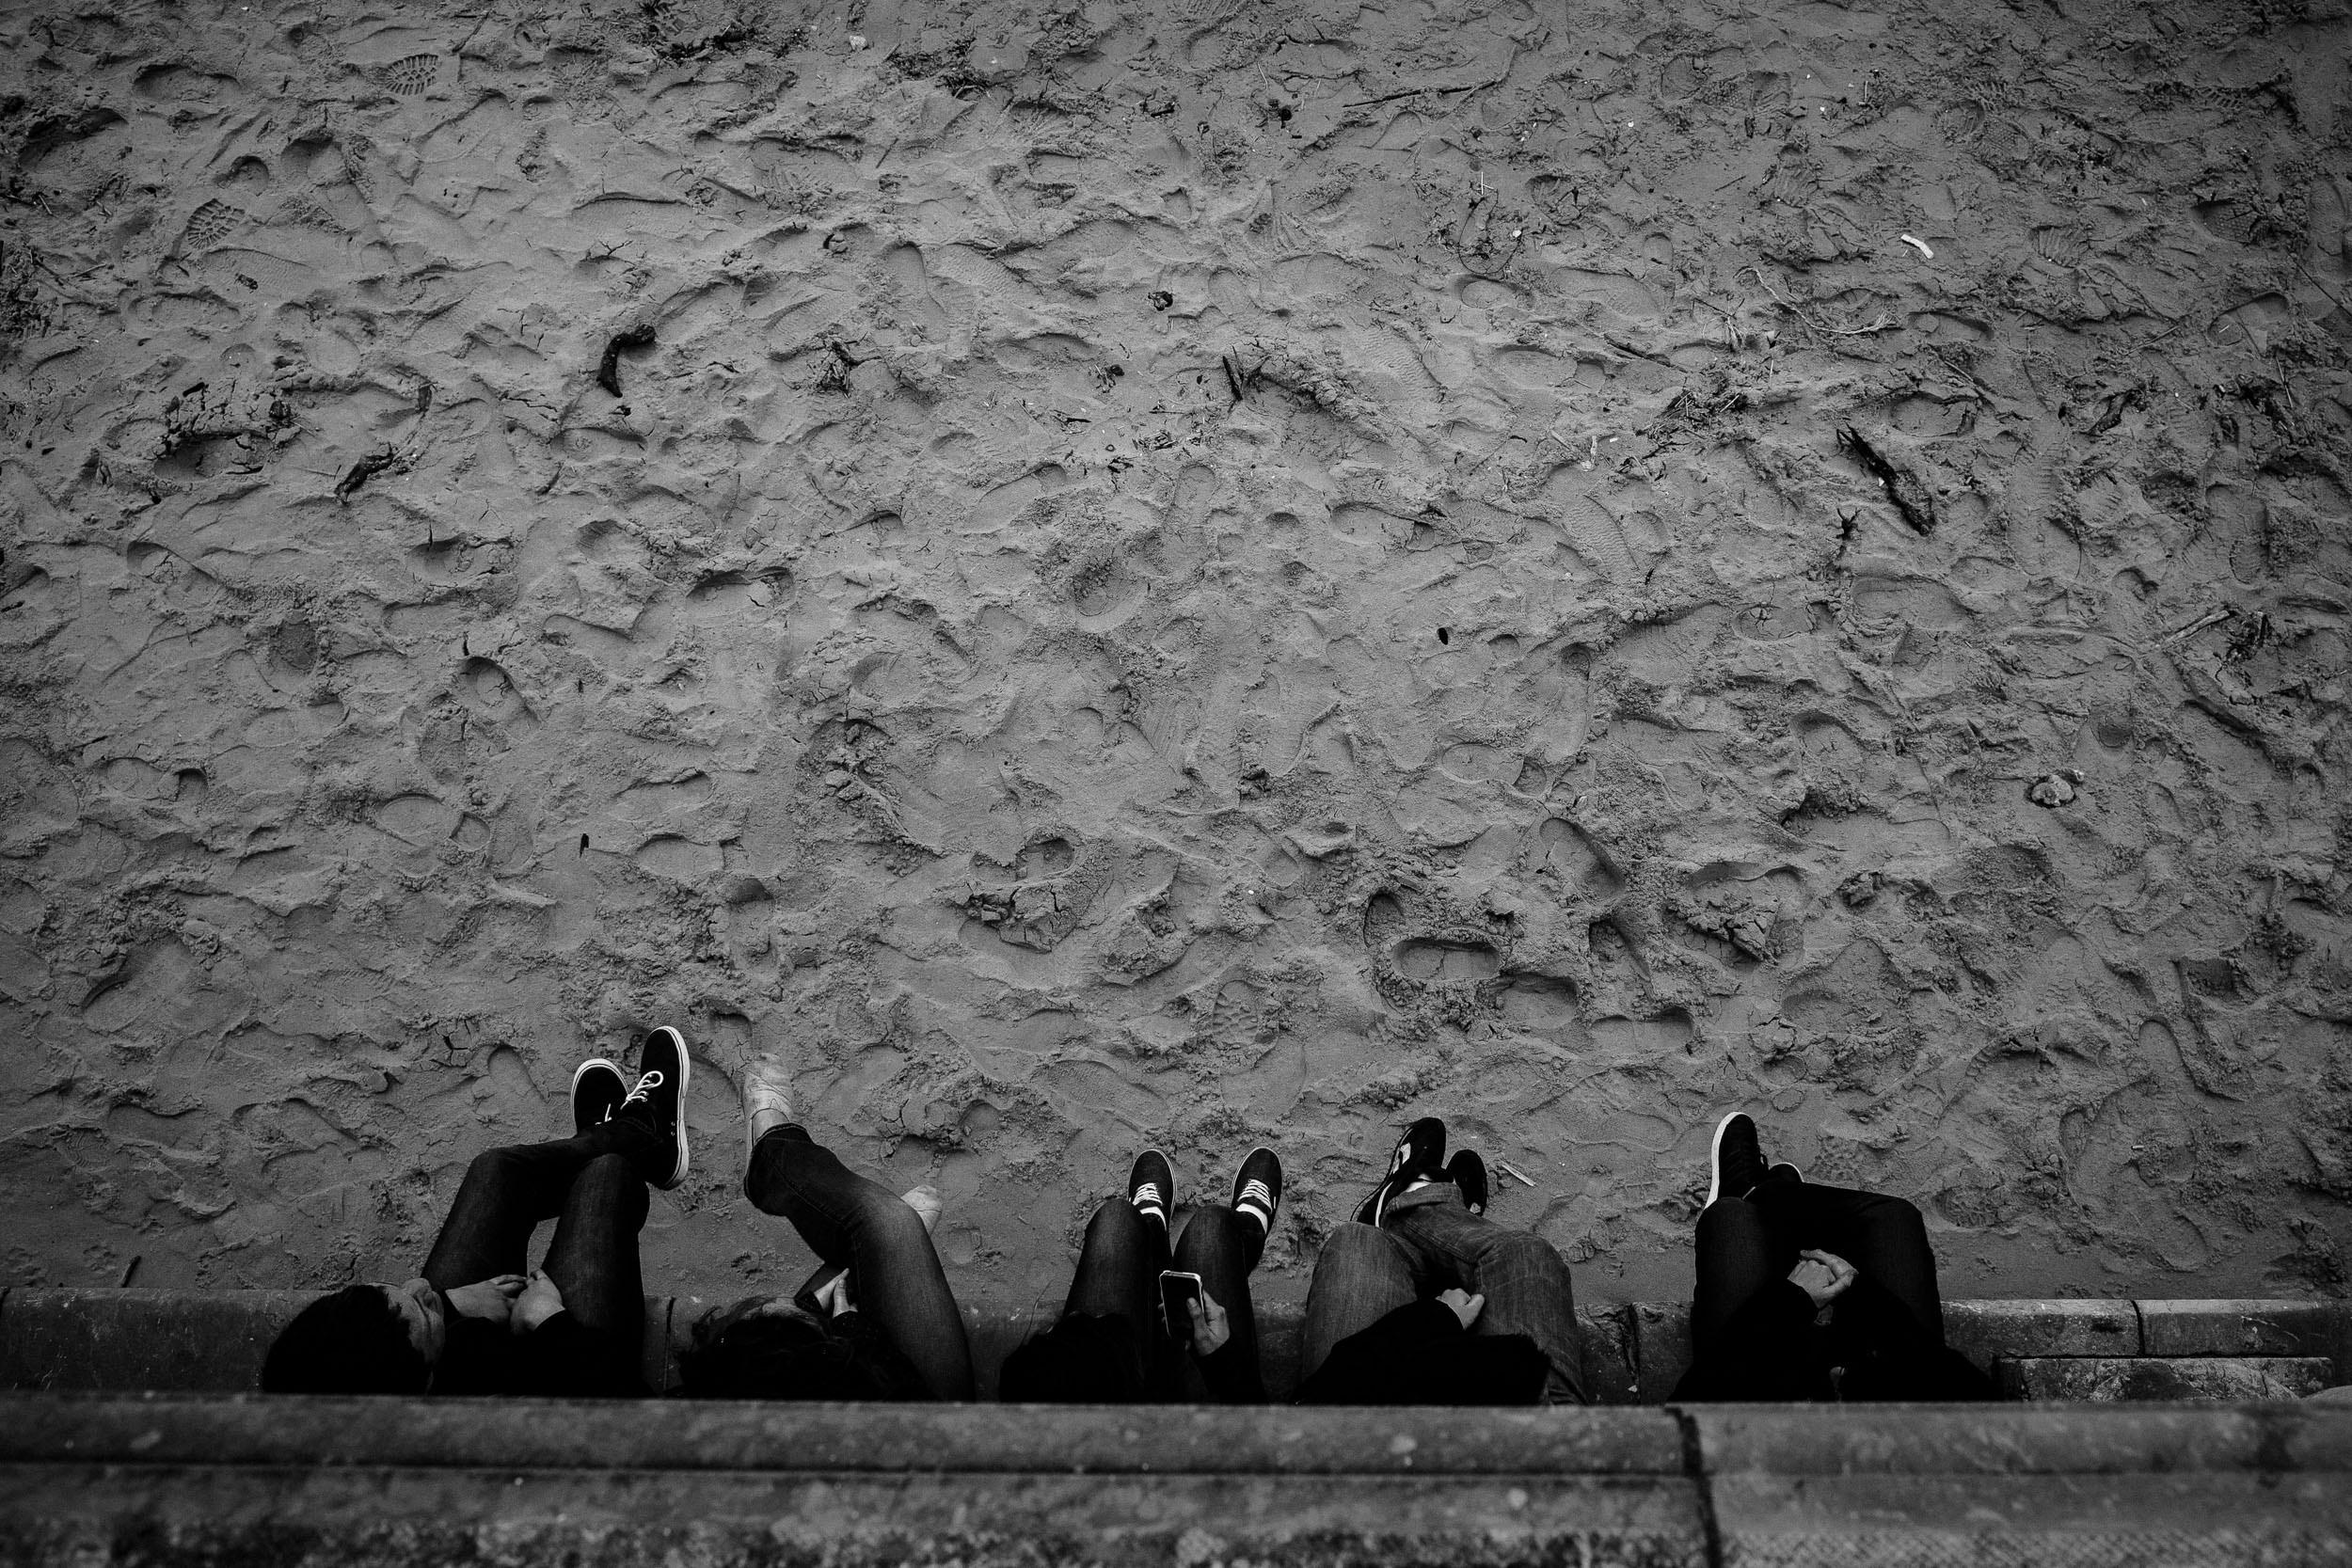 Wedding Photography in San Sebastian | Spring Photos on La Concha Beach San Sebastian Gipuzkoa Basque Country Spain - James Sturcke  Photographer | sturcke.org_009.jpg